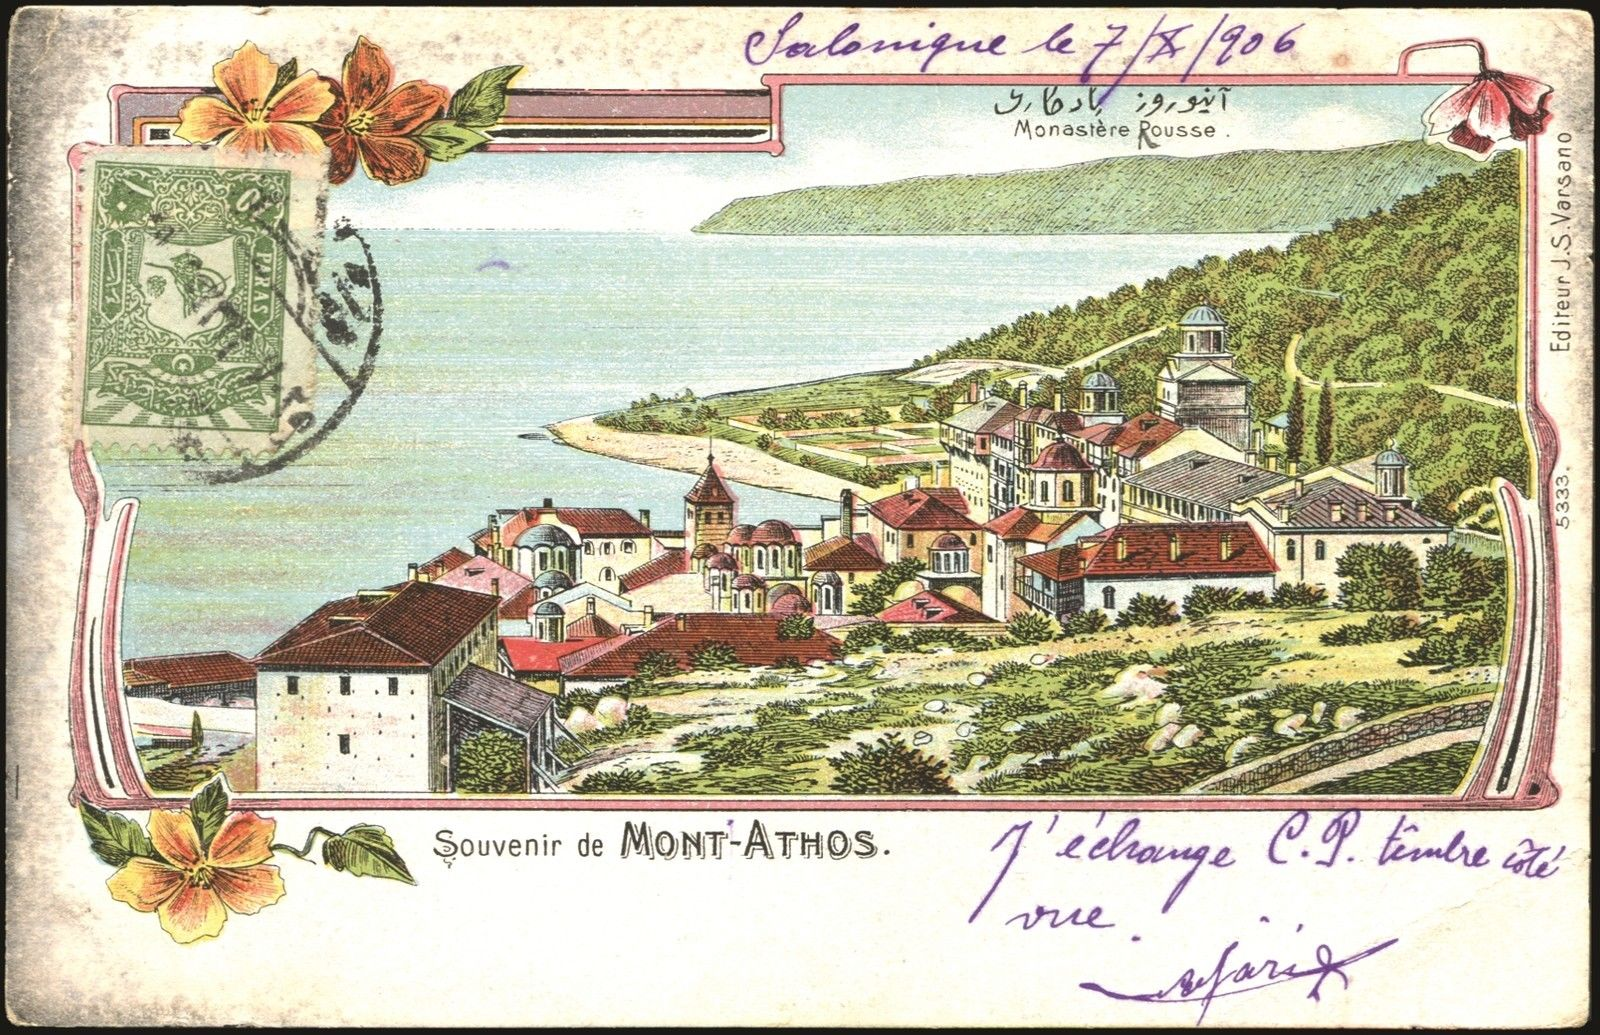 1600x1035 1520 Old Postcards From Athos By J.s. Varsano Athos Agion Oros